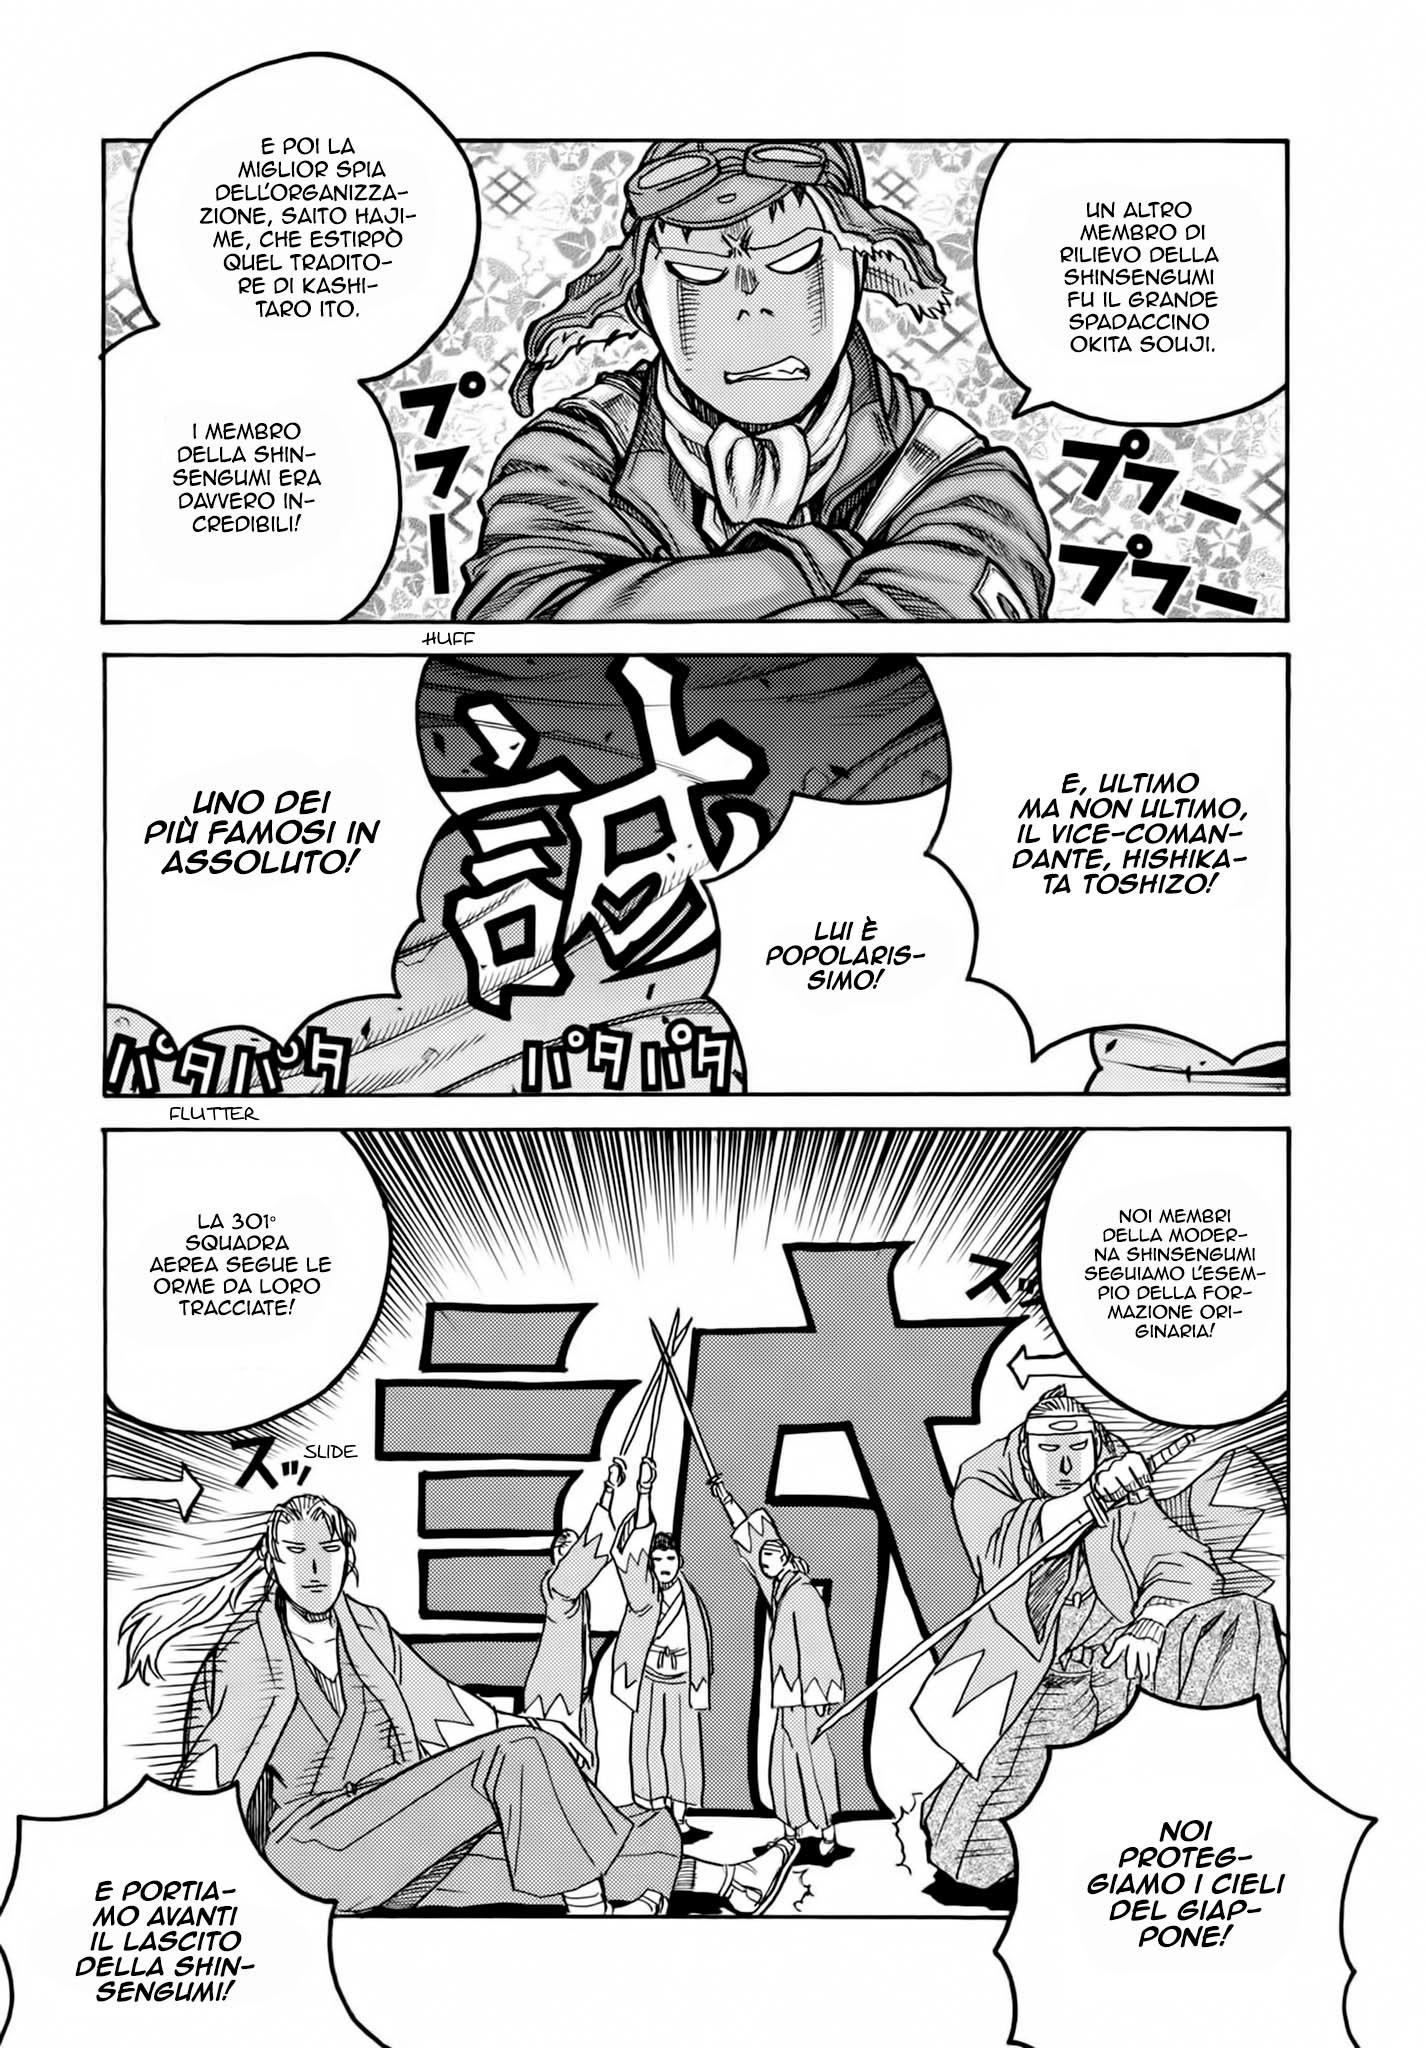 https://nine.mangadogs.com/it_manga/pic/16/336/295835/Drifters74AsteroidBlues138.jpg Page 13